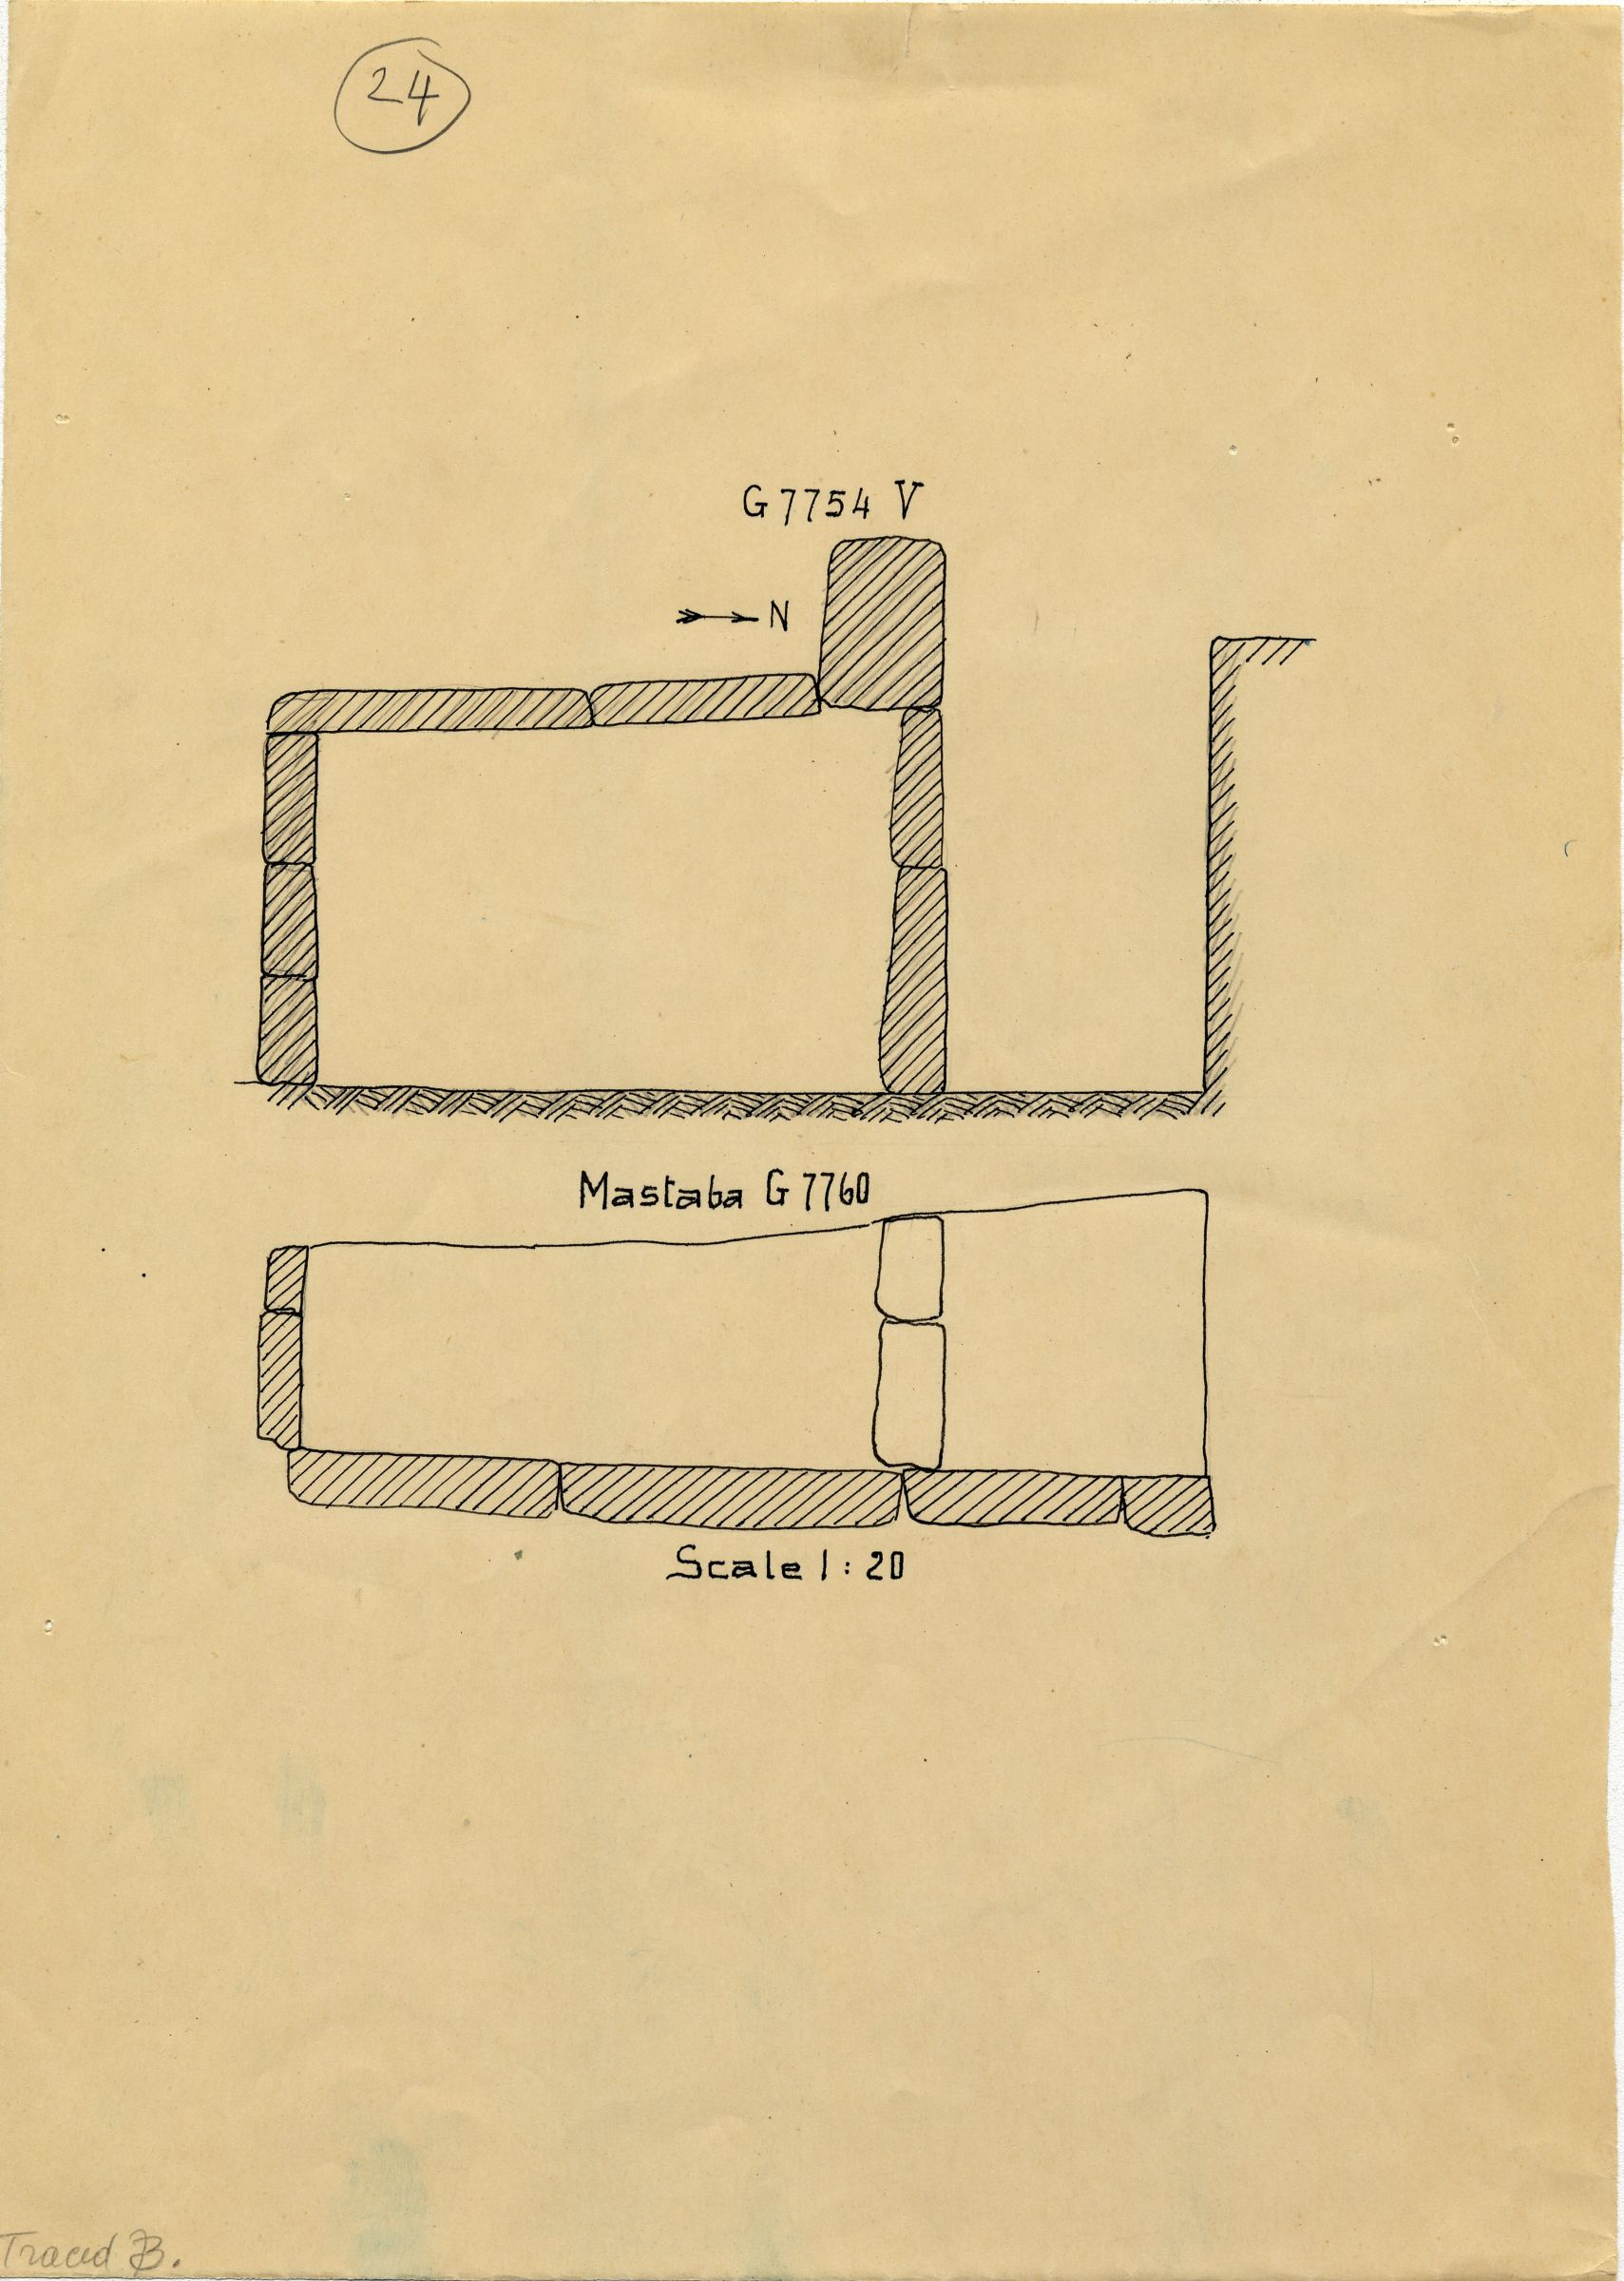 Maps and plans: G 7754, Shaft V